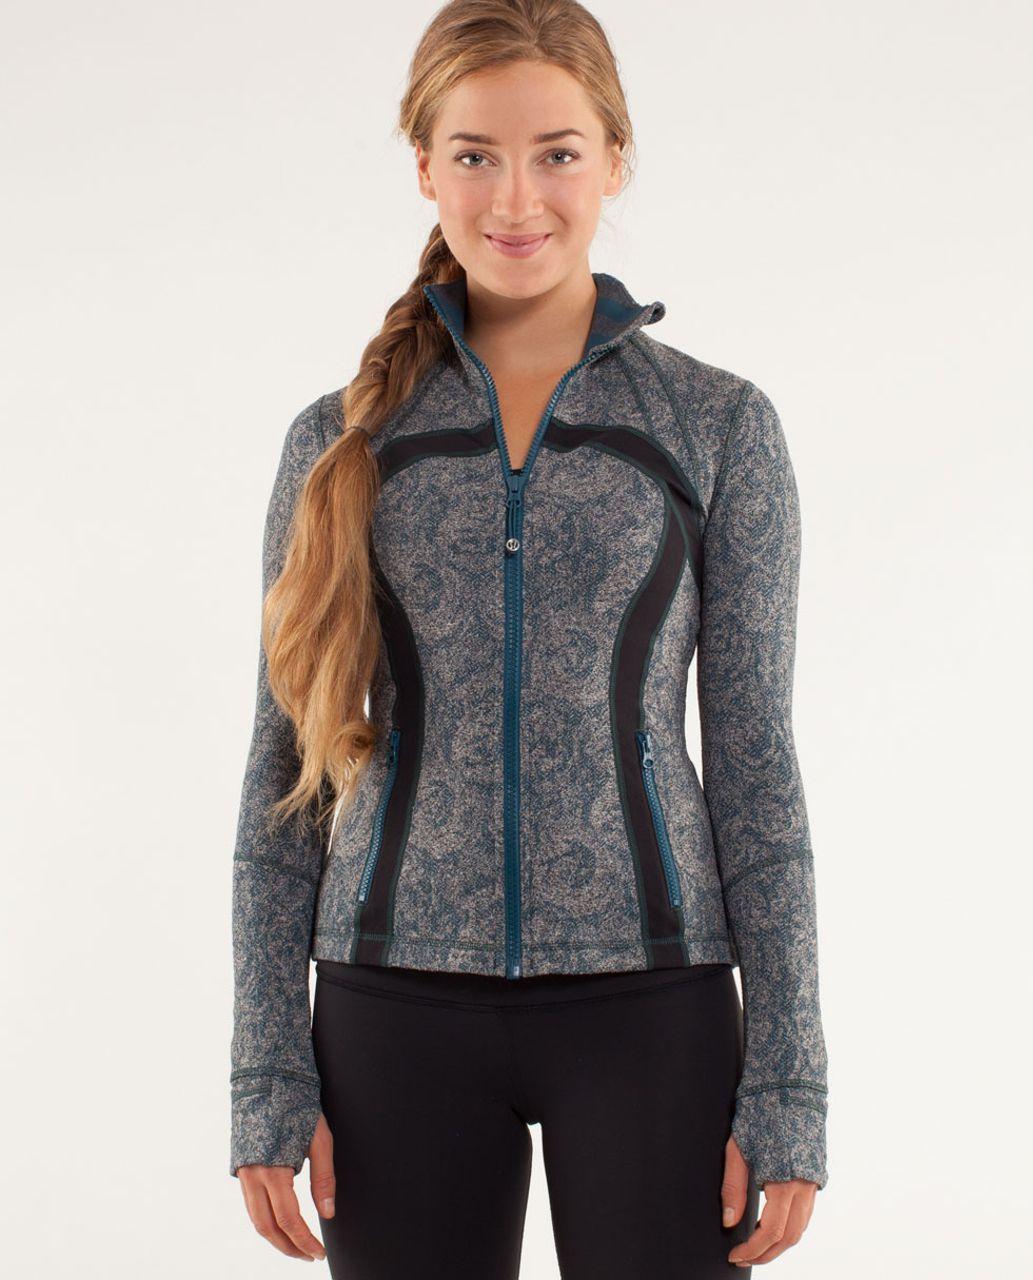 Lululemon Define Jacket *Brushed - Rose Herringbone Alberta Lake / Black / Micro Macro Alberta Lake Heathered Black